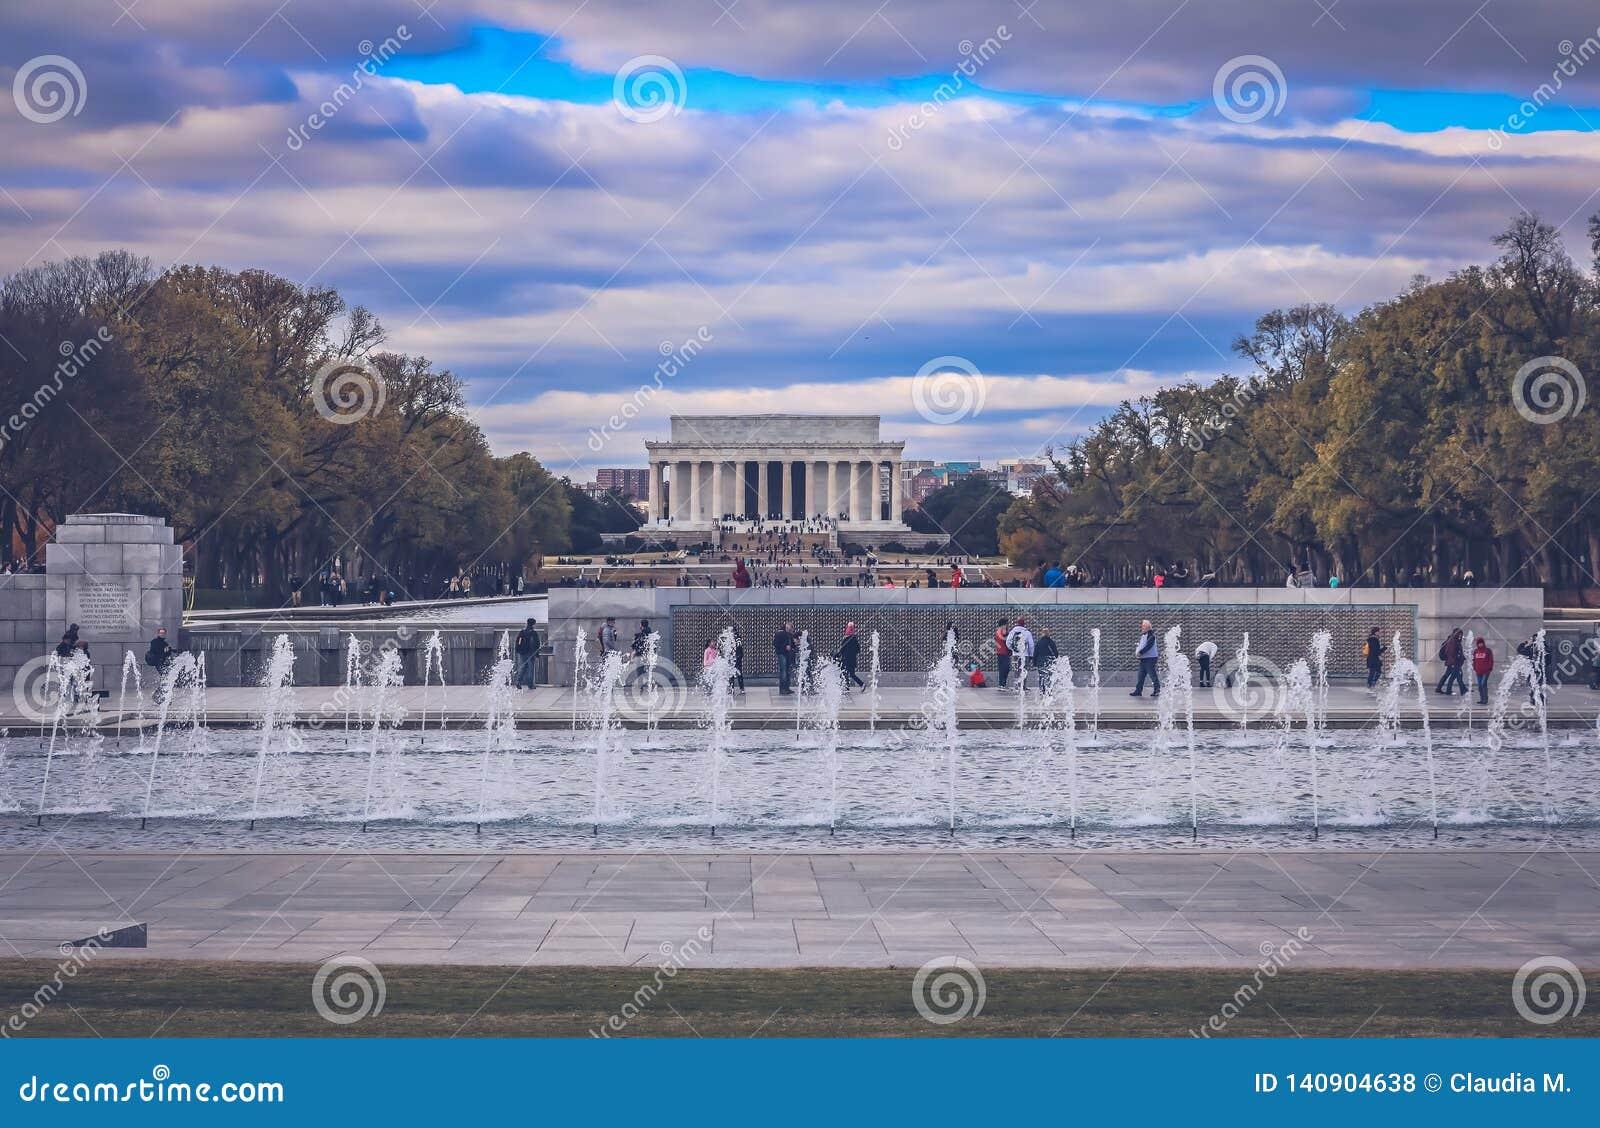 Lincoln memorial monument in Washington